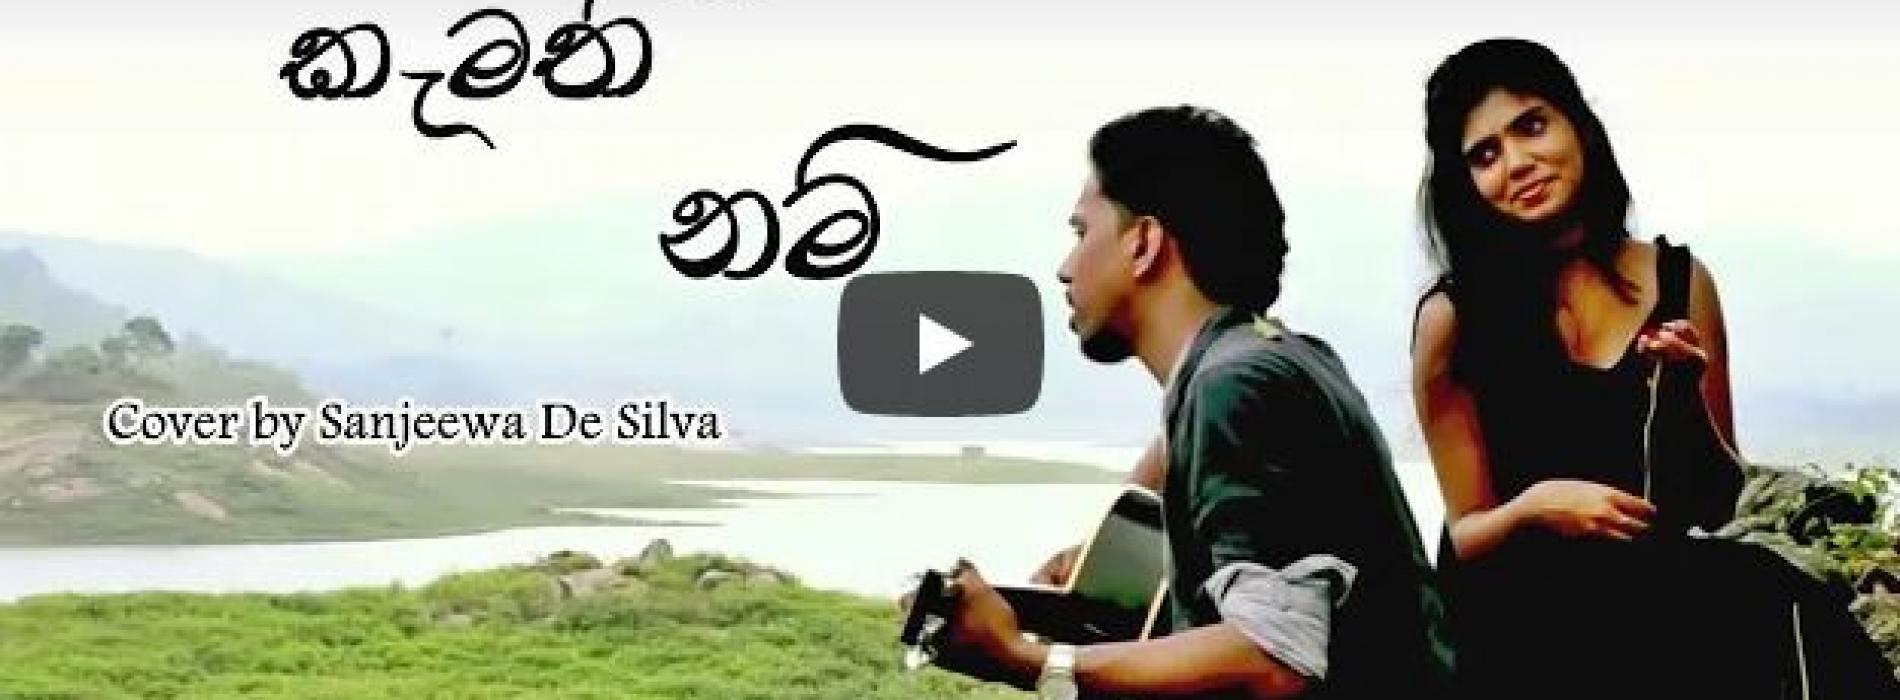 New Music : ඔබ කැමති නම් (Oba Kamathi Nam)   Gypsies cover by Sanjeewa De Silva